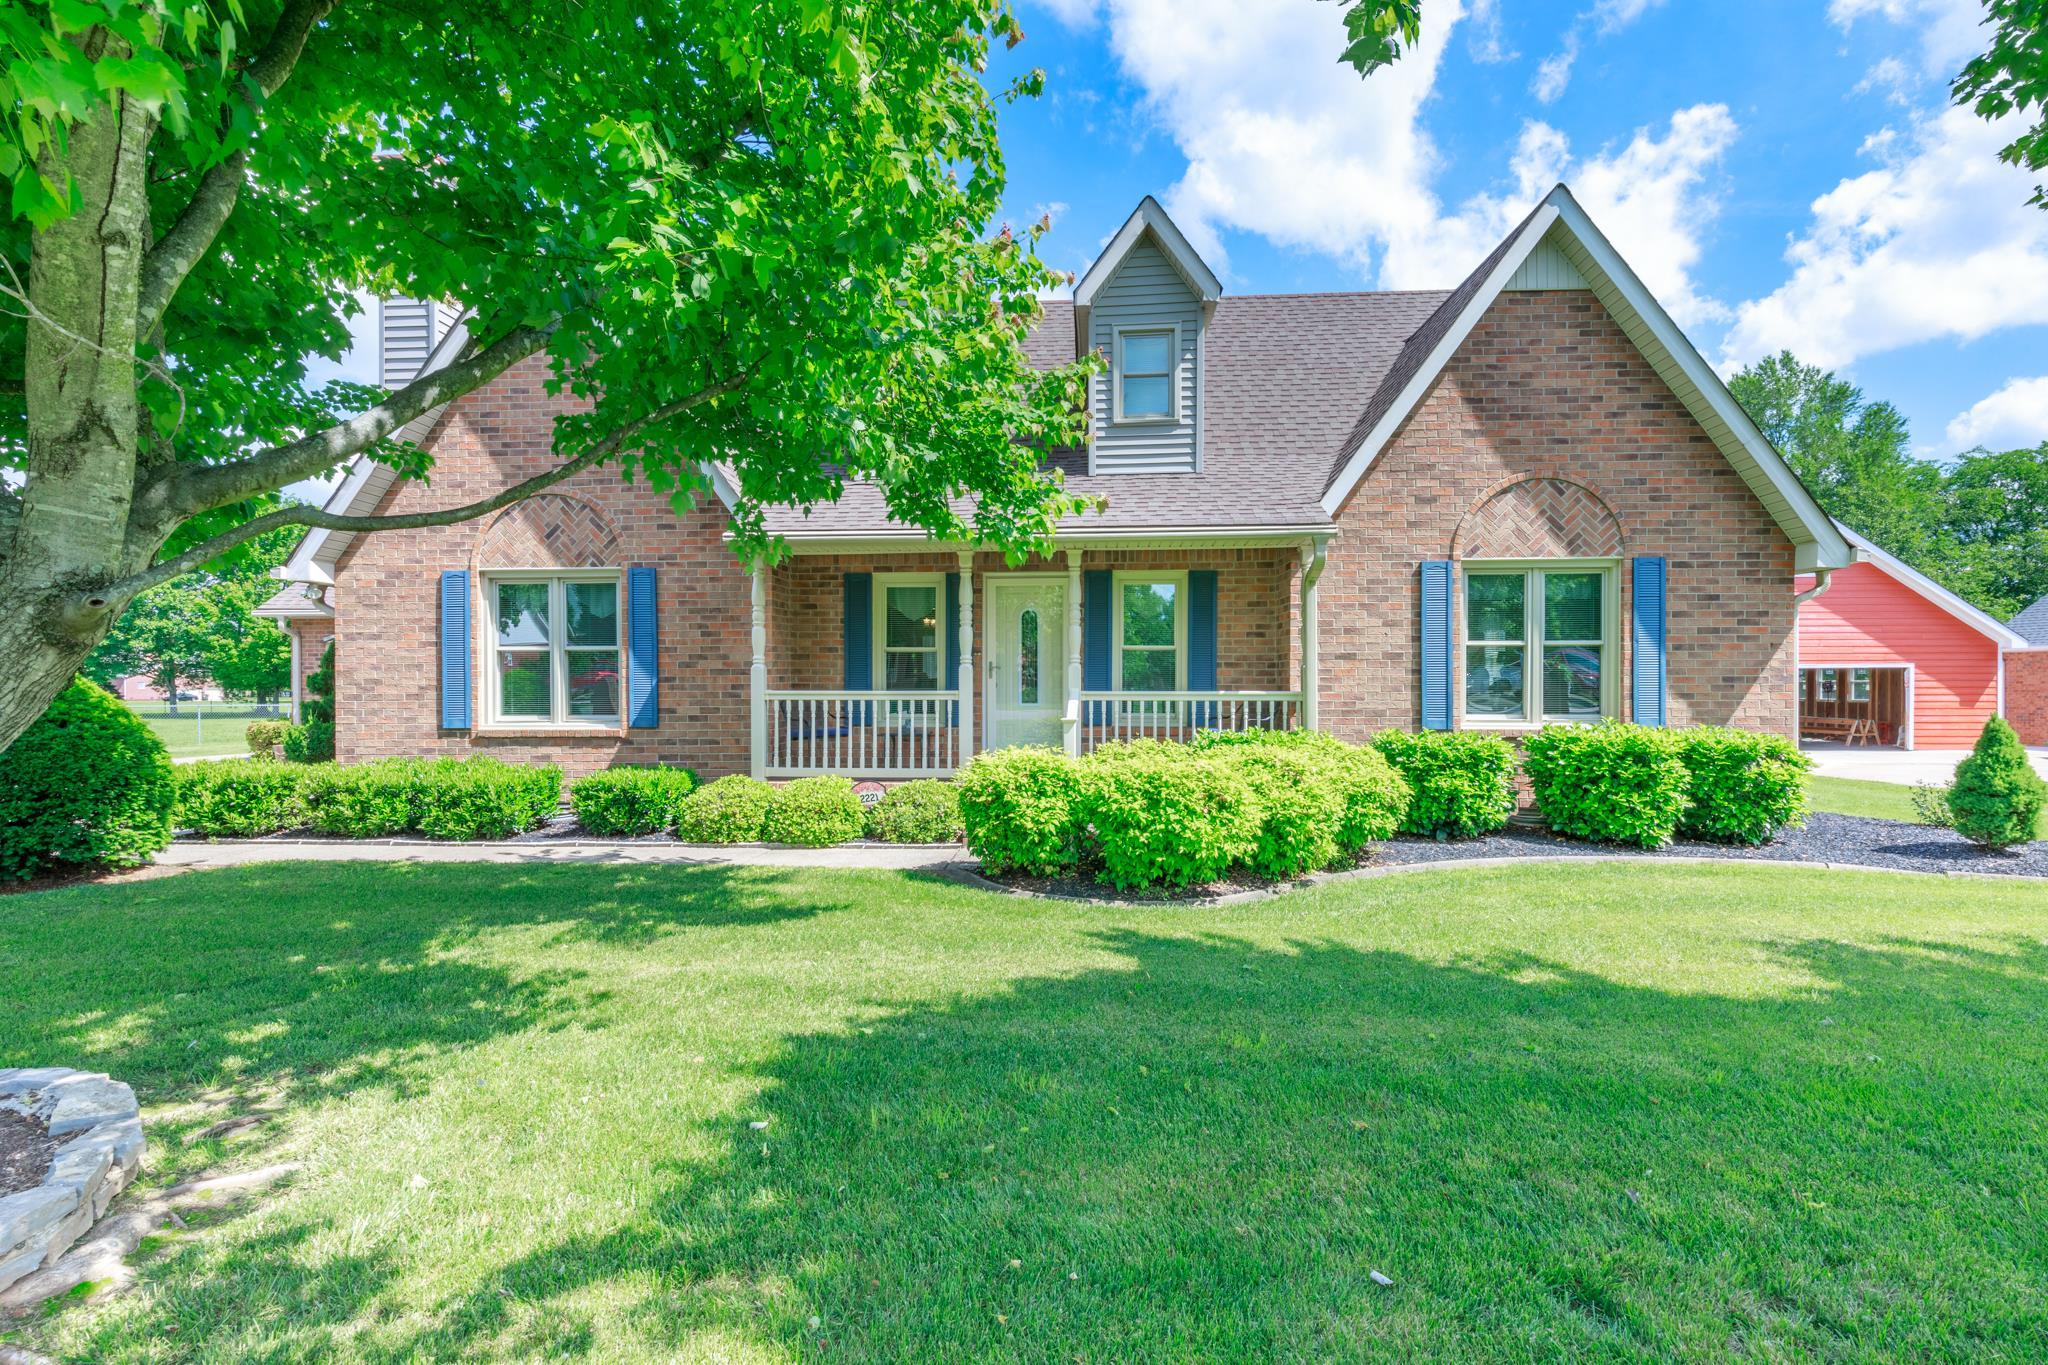 2221 Red Mile Rd, Murfreesboro, TN 37127 - Murfreesboro, TN real estate listing